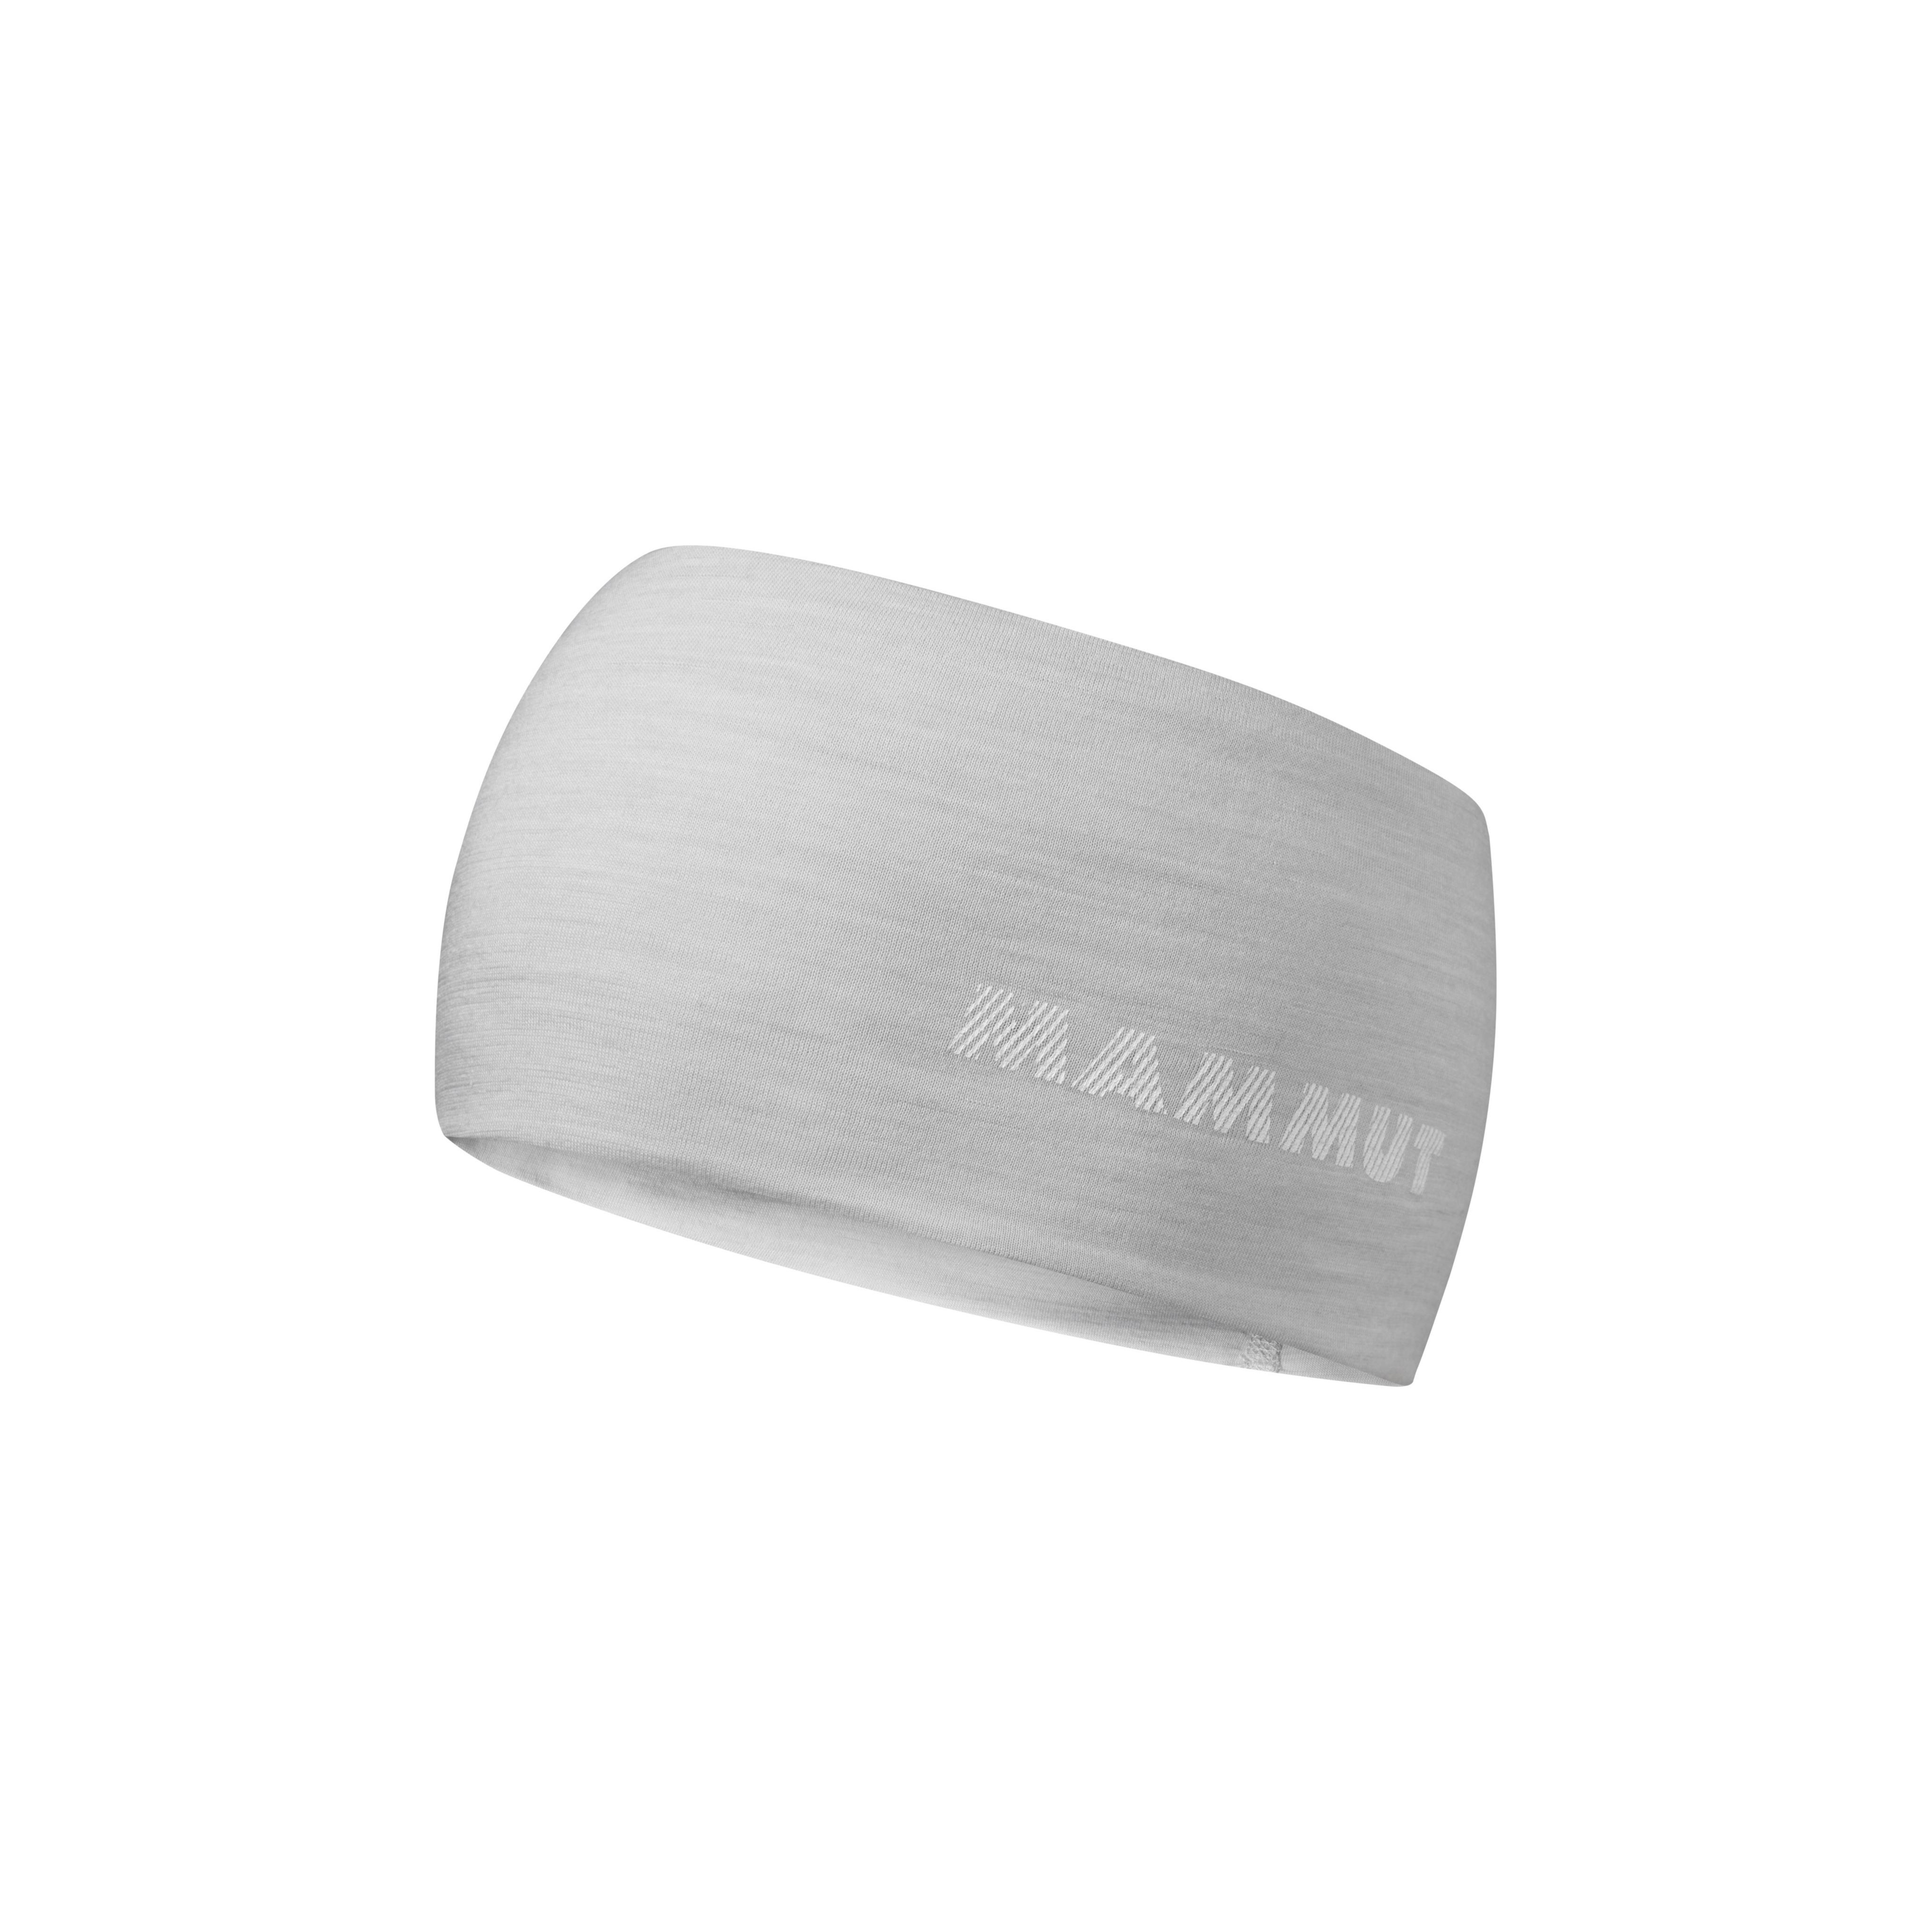 Merino Headband - highway mélange, one size thumbnail